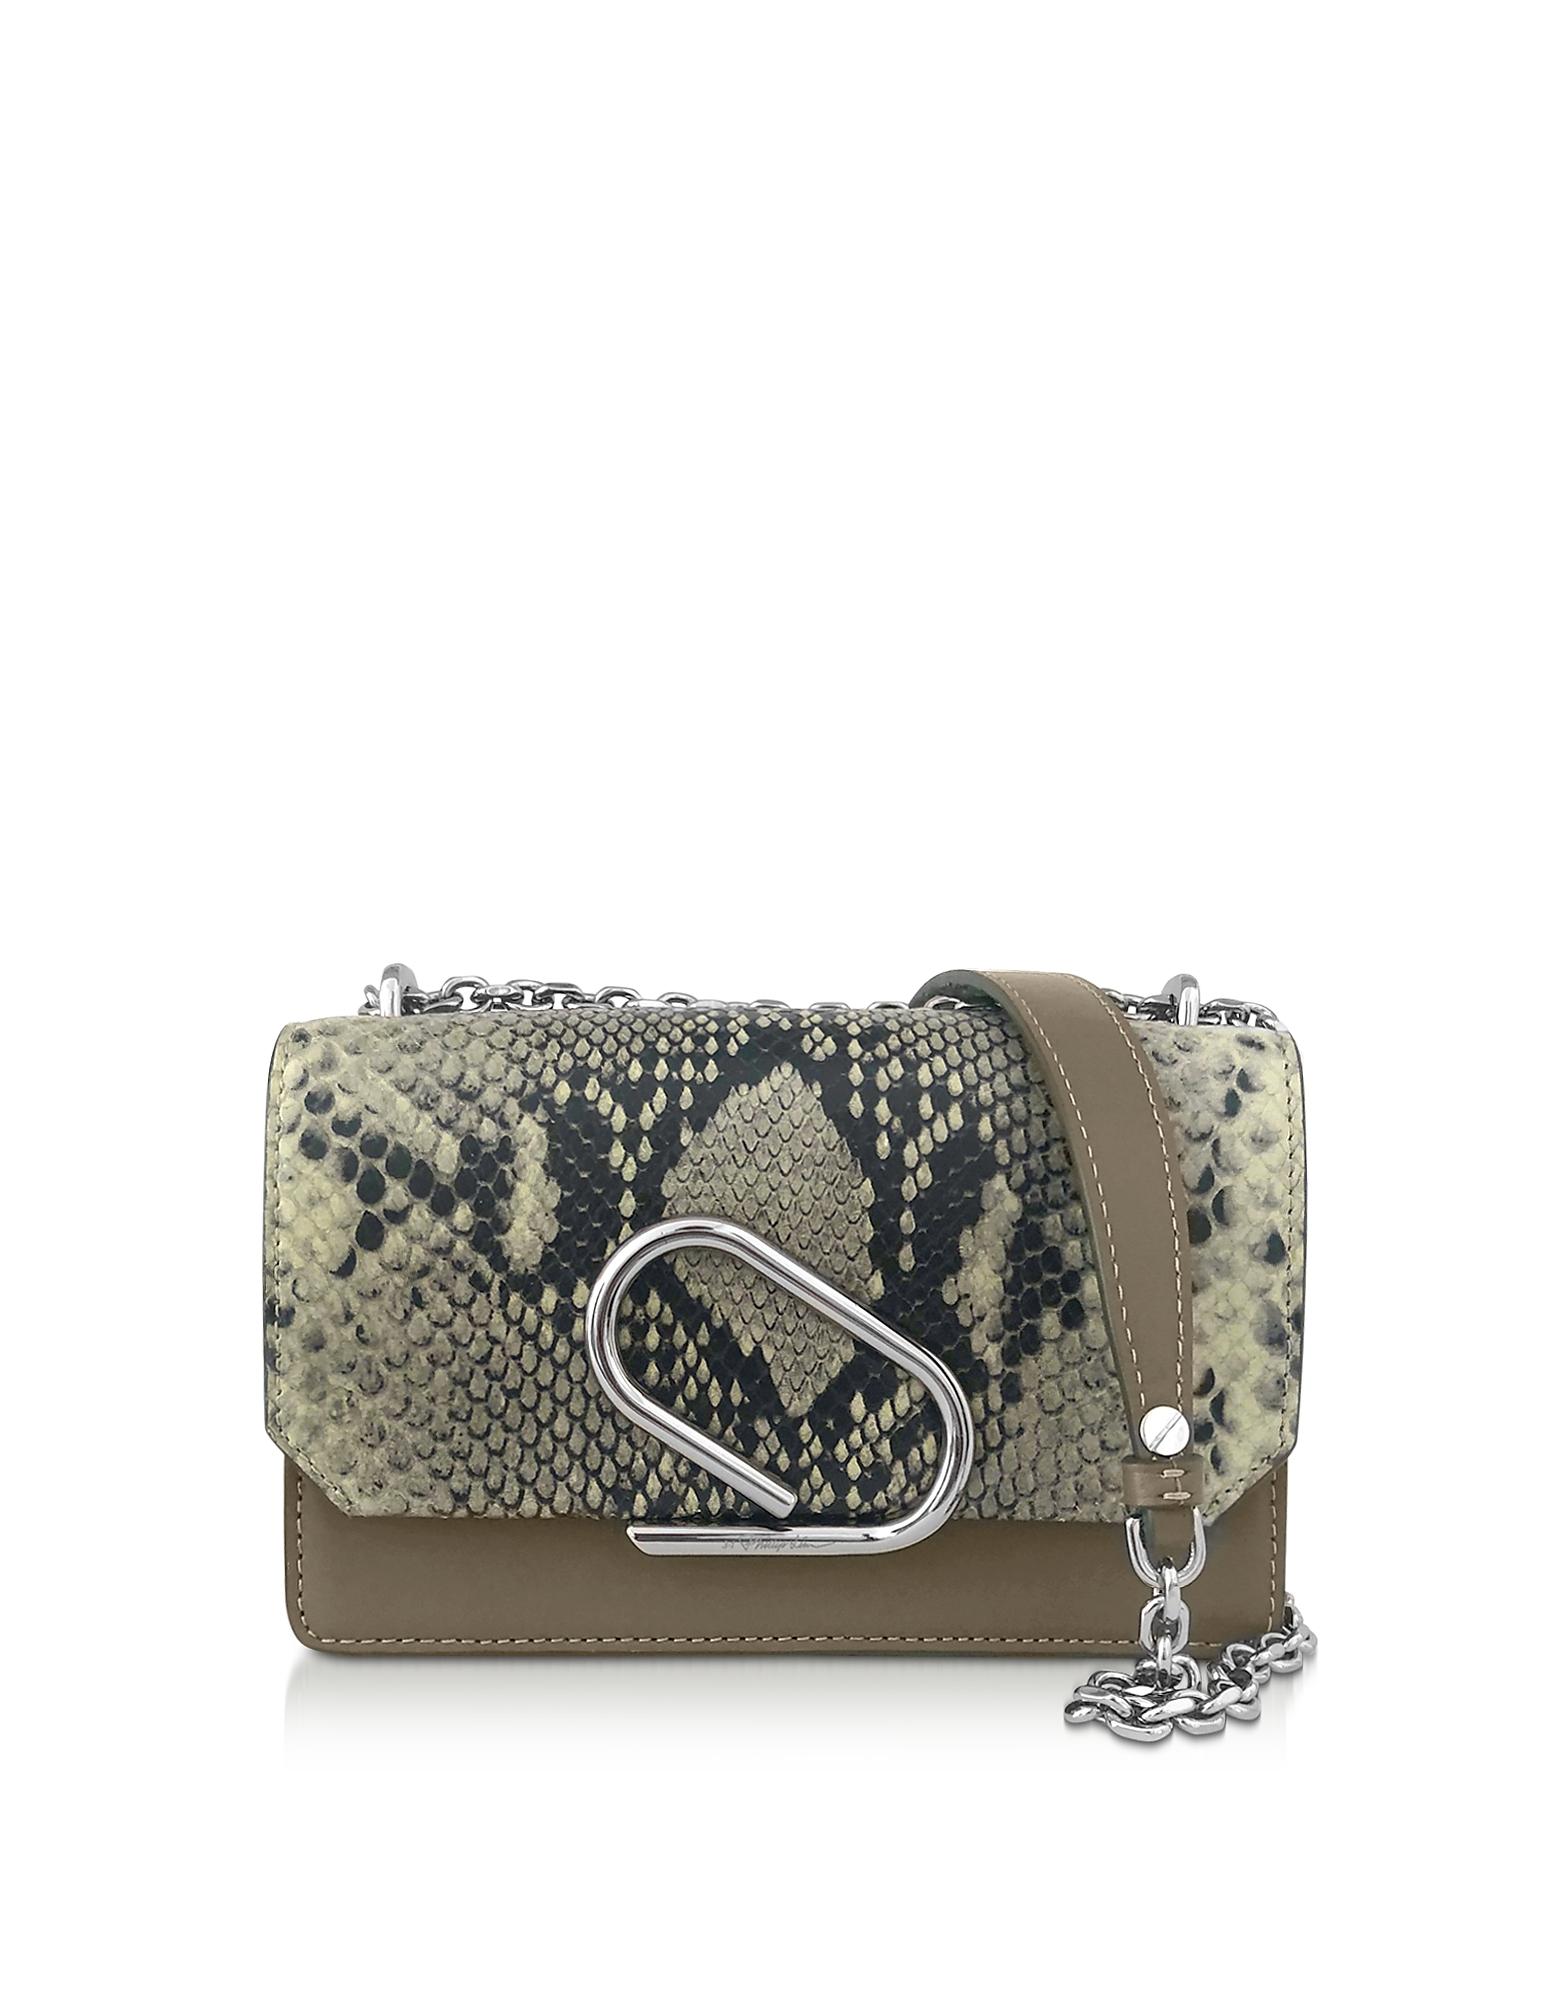 3.1 Phillip Lim  Handbags Animal Printed Leather Alix Chain Clutch